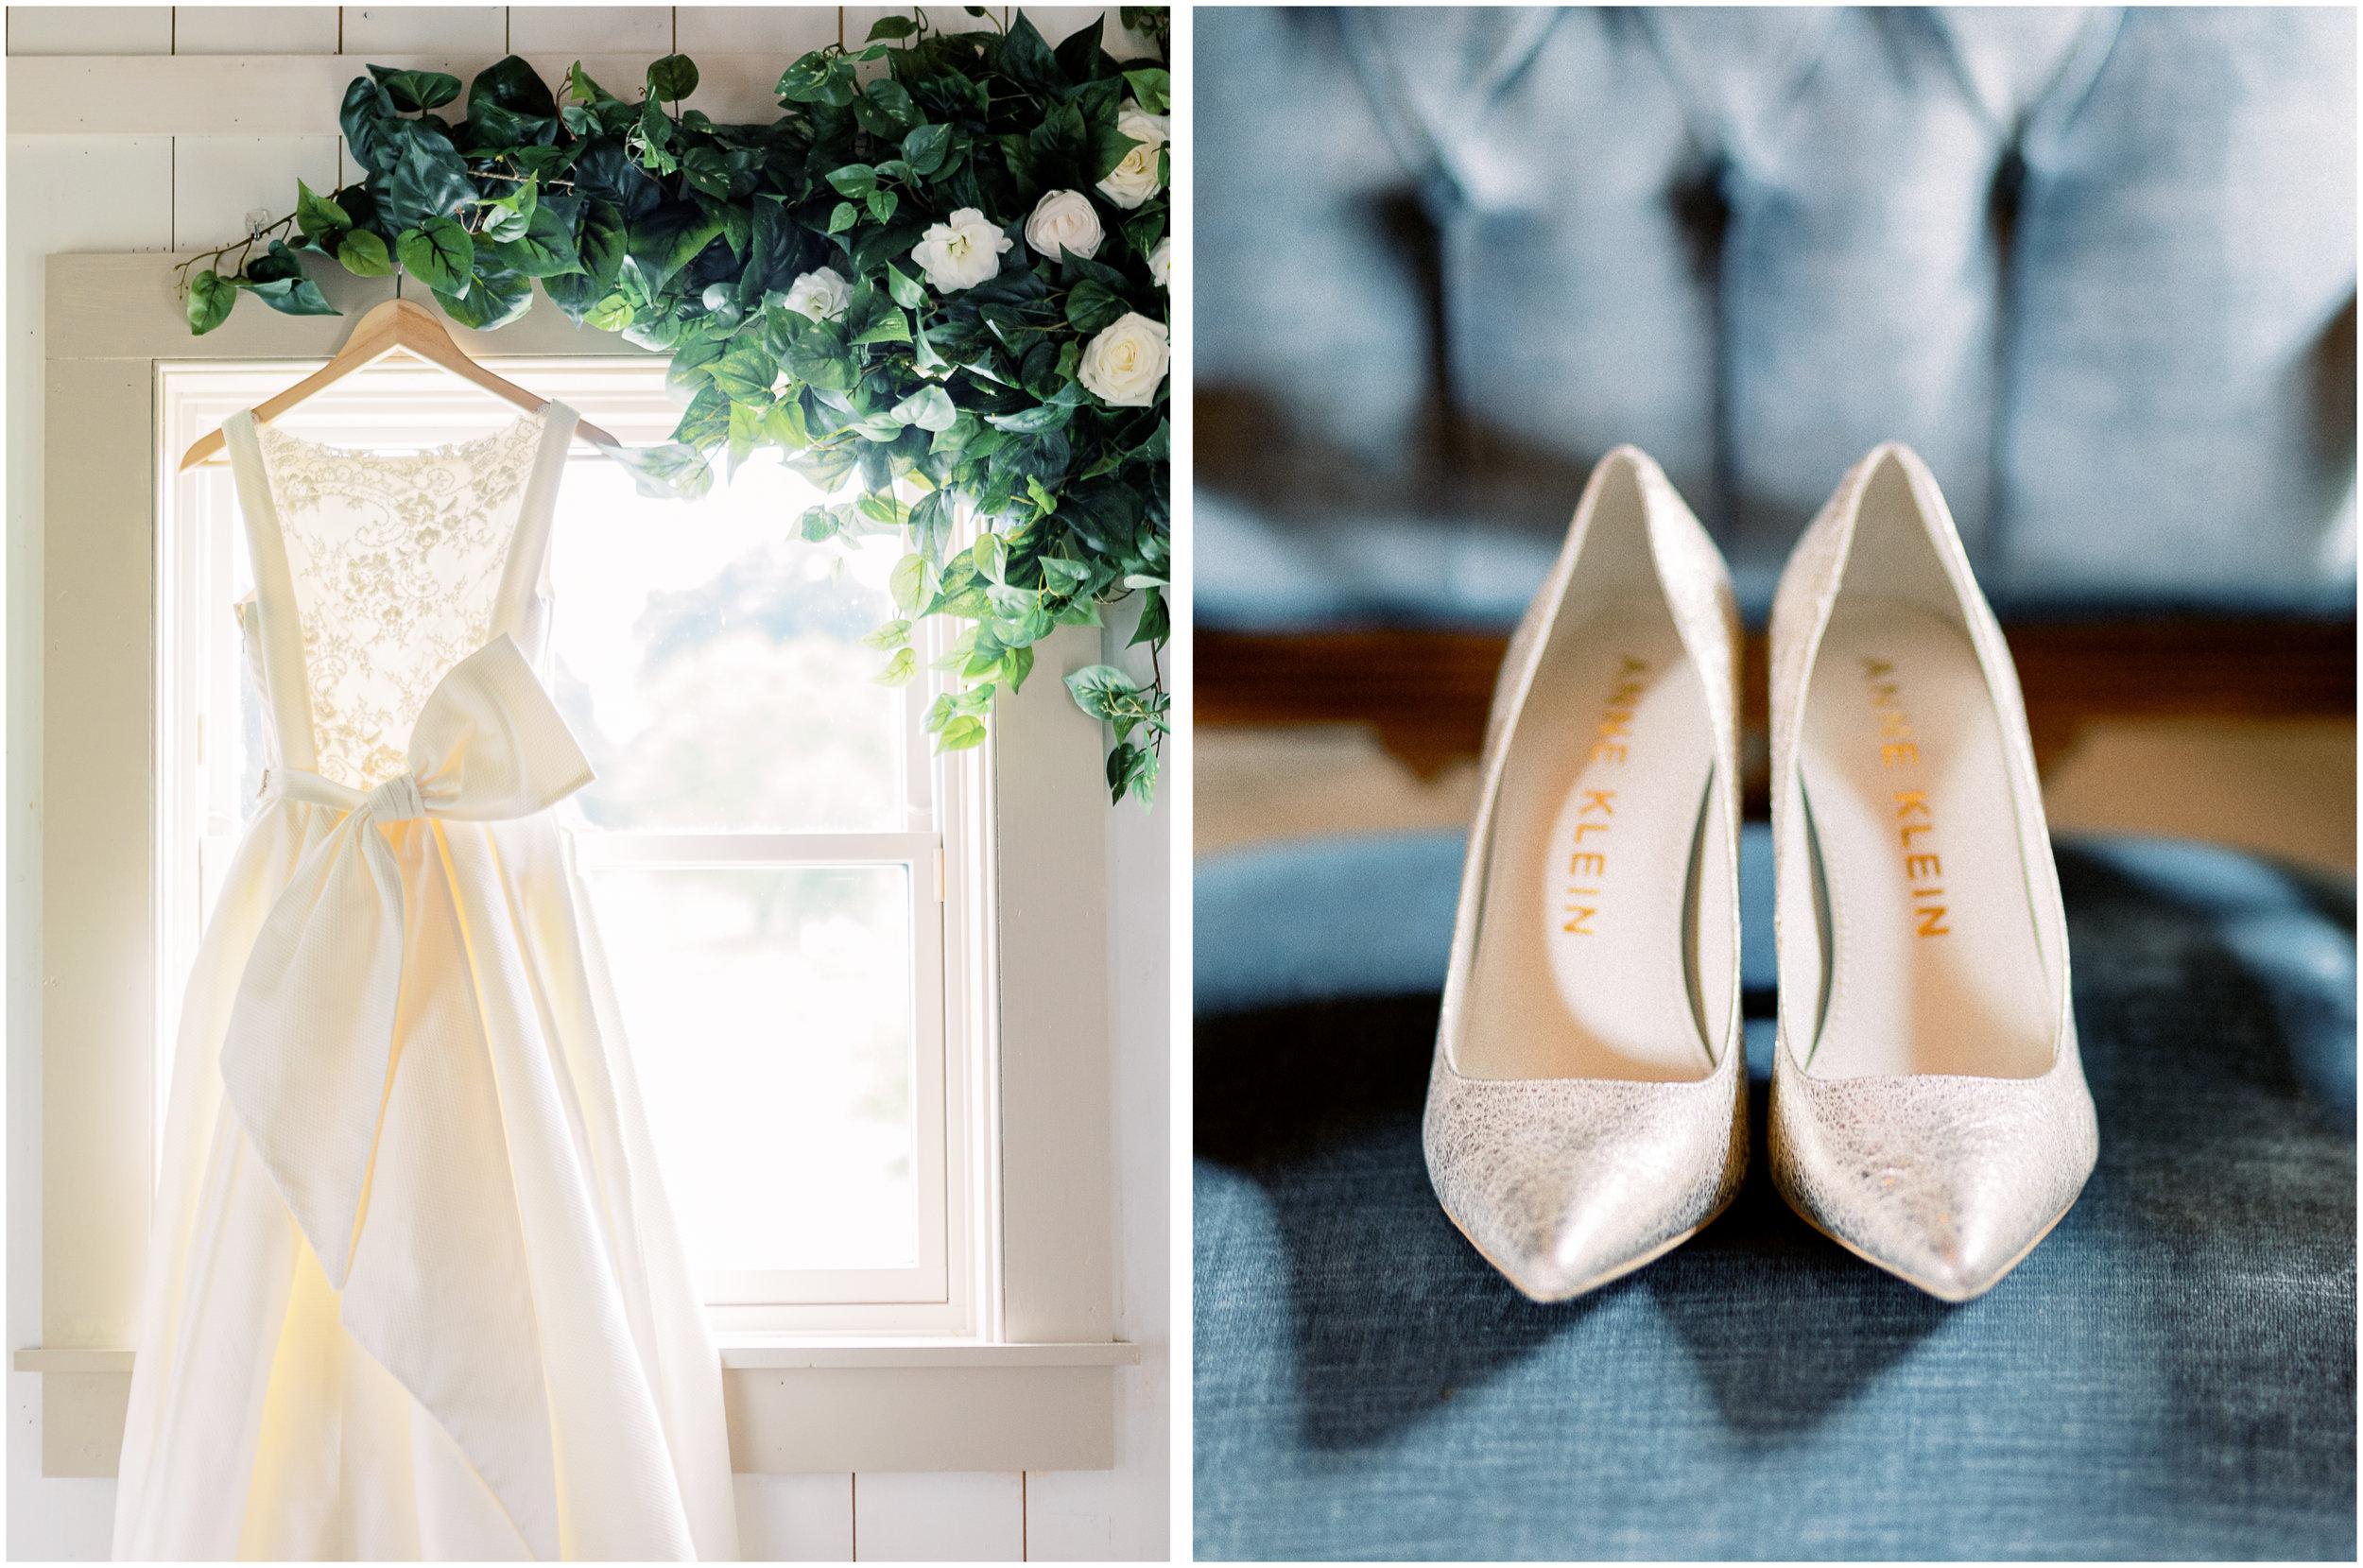 pittsburgh-wedding-photographer-garden-wedding-bumbleburgh-pennsylvania-elegant-wedding-details.jpg